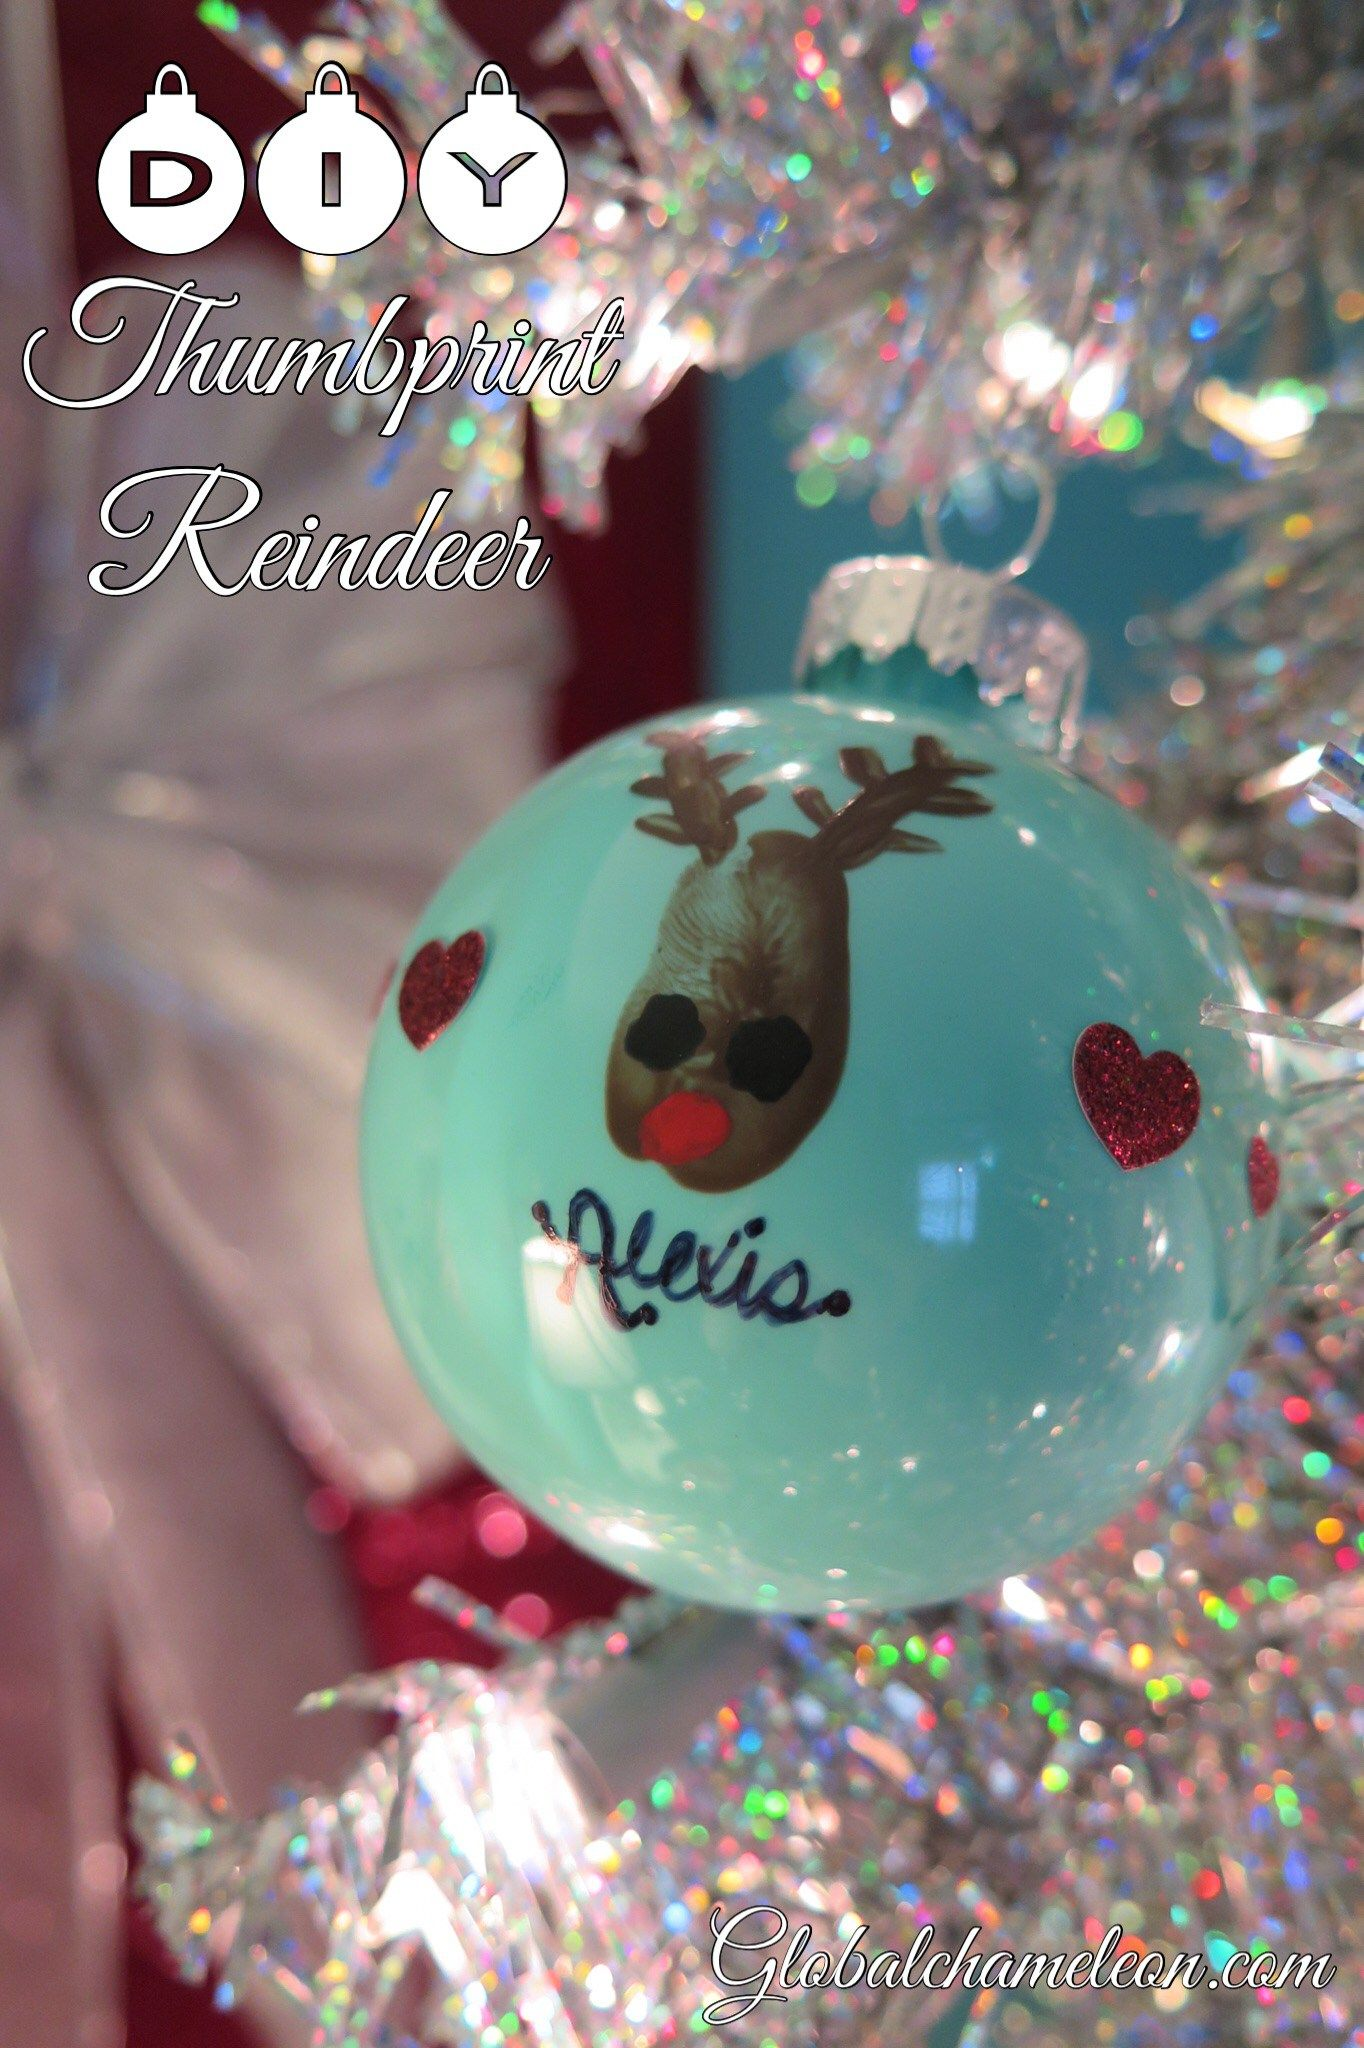 12 Days Of Diy Ornaments Day 6 Thumbprint Reindeer Ornament Reindeer Ornaments Diy Christmas Ornaments Christmas Ornaments